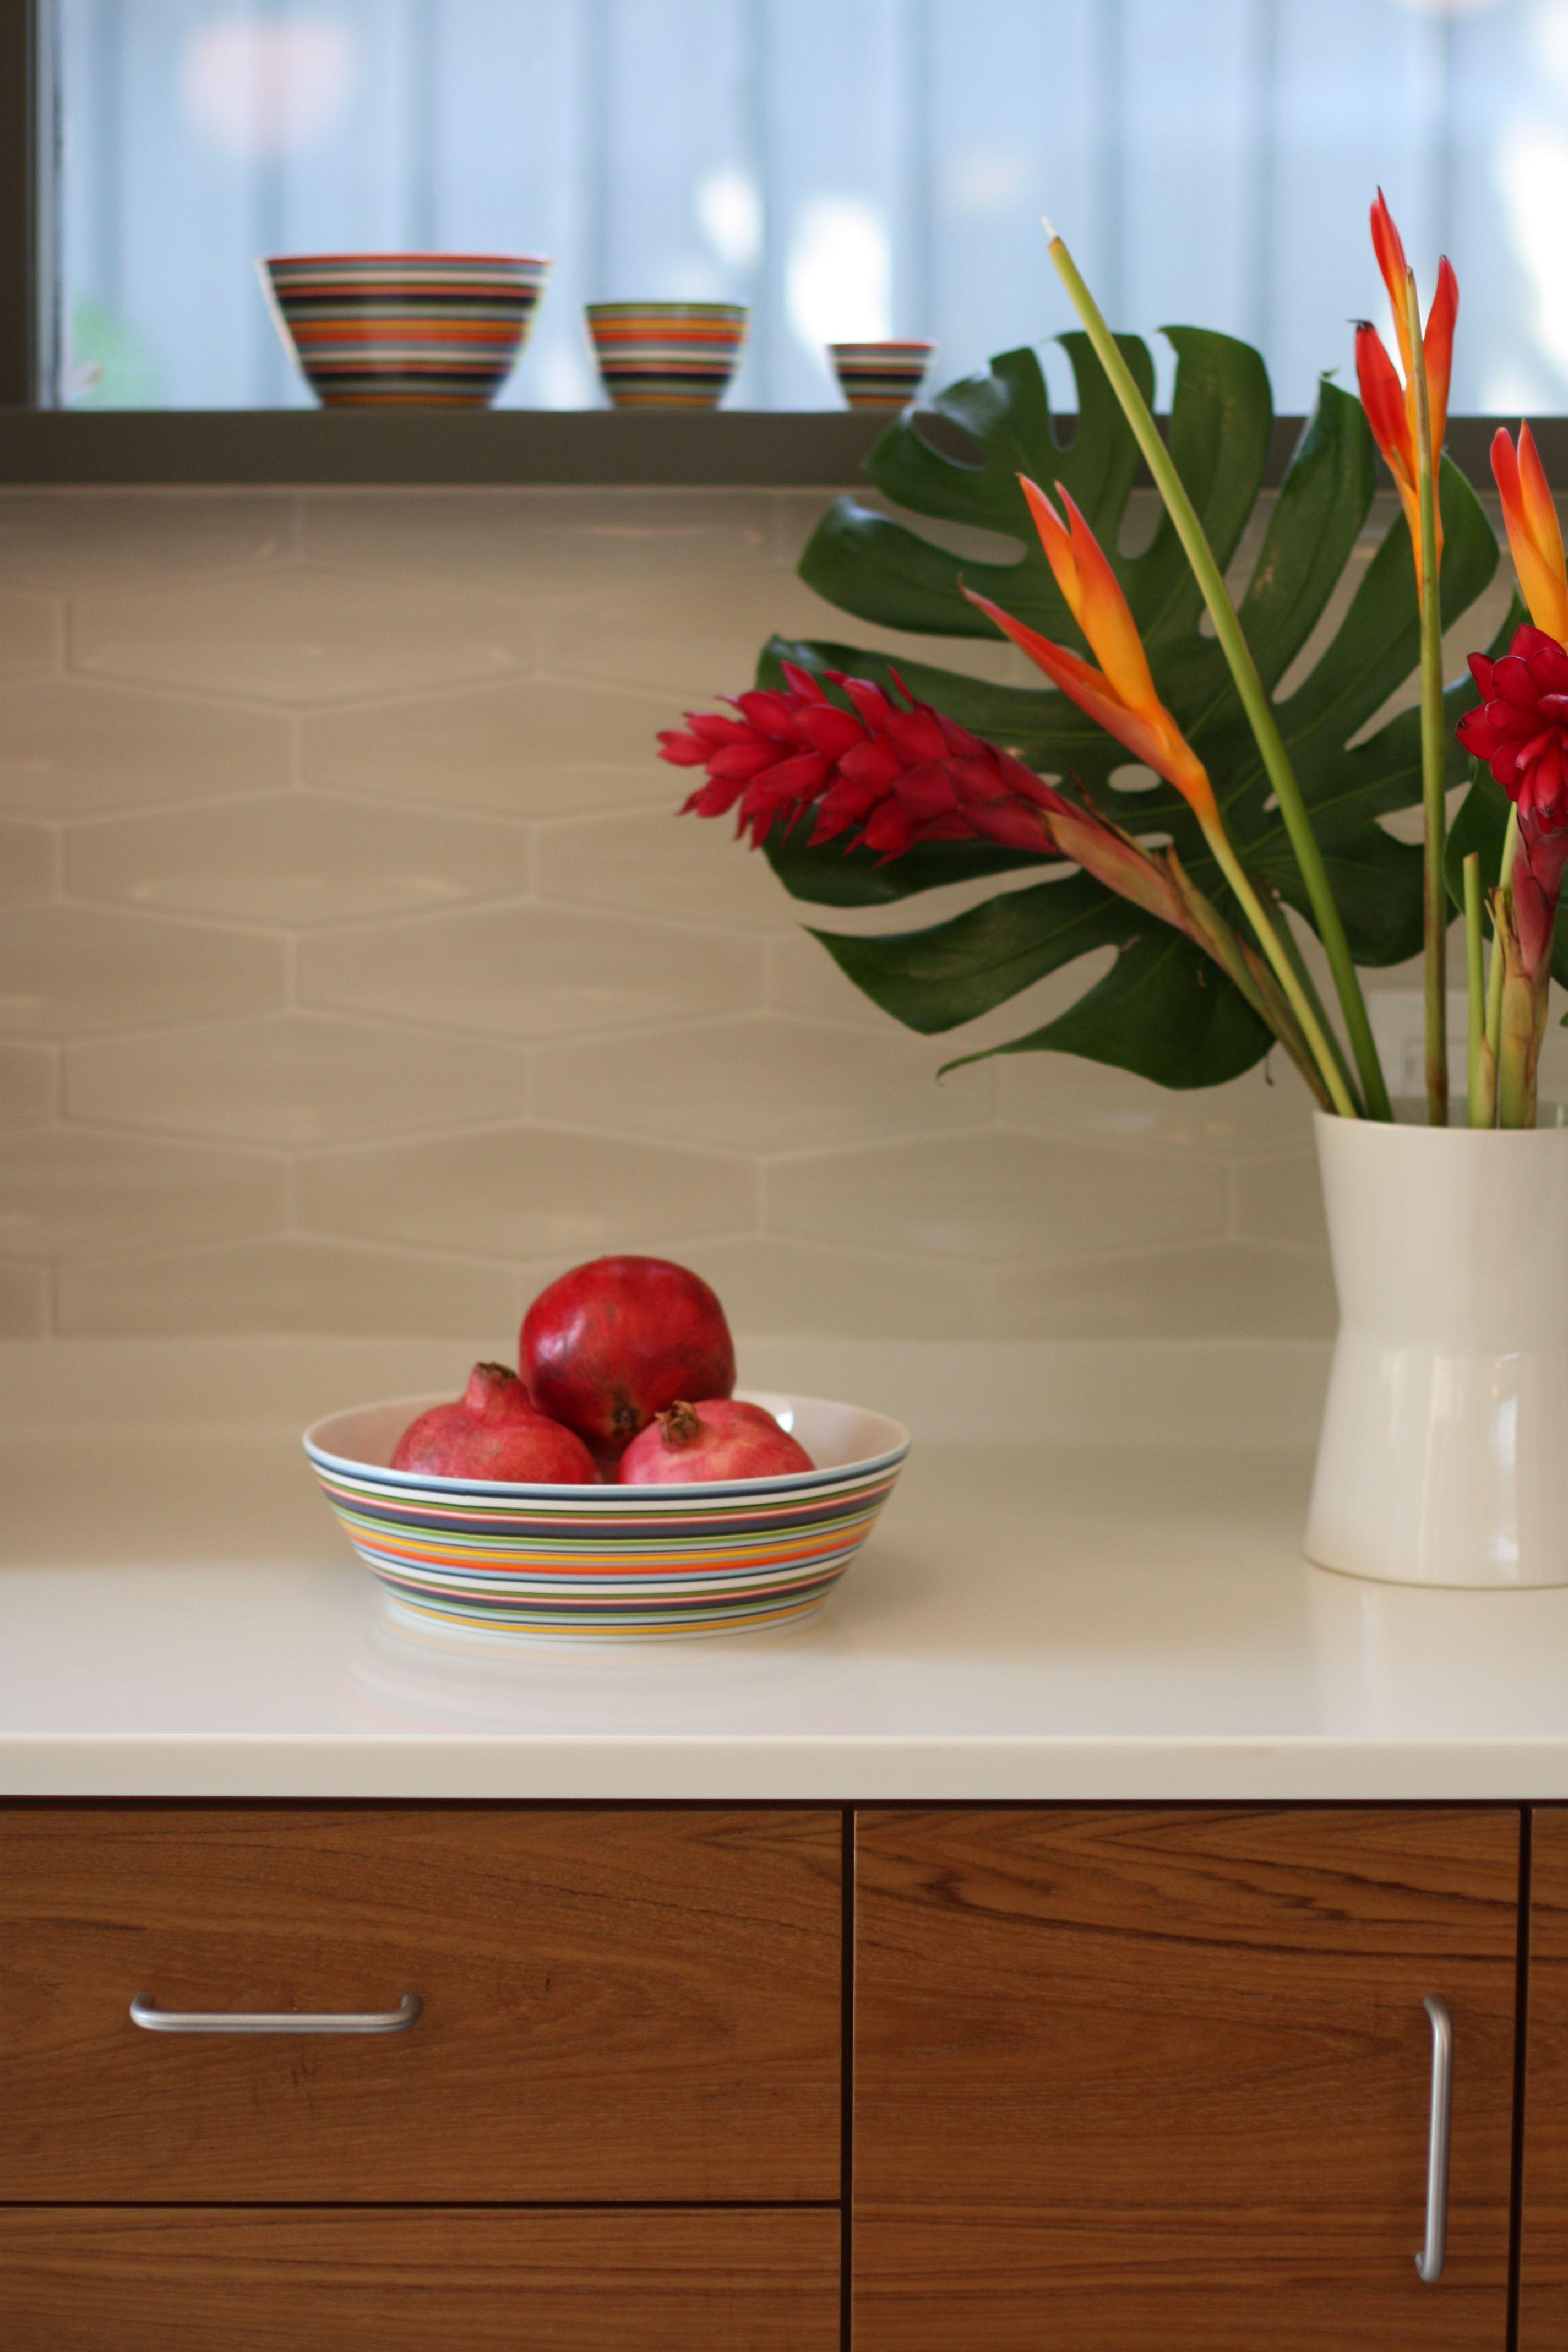 Detail from Rubin kitchen] check the Heath diamond dimensional tiles ...